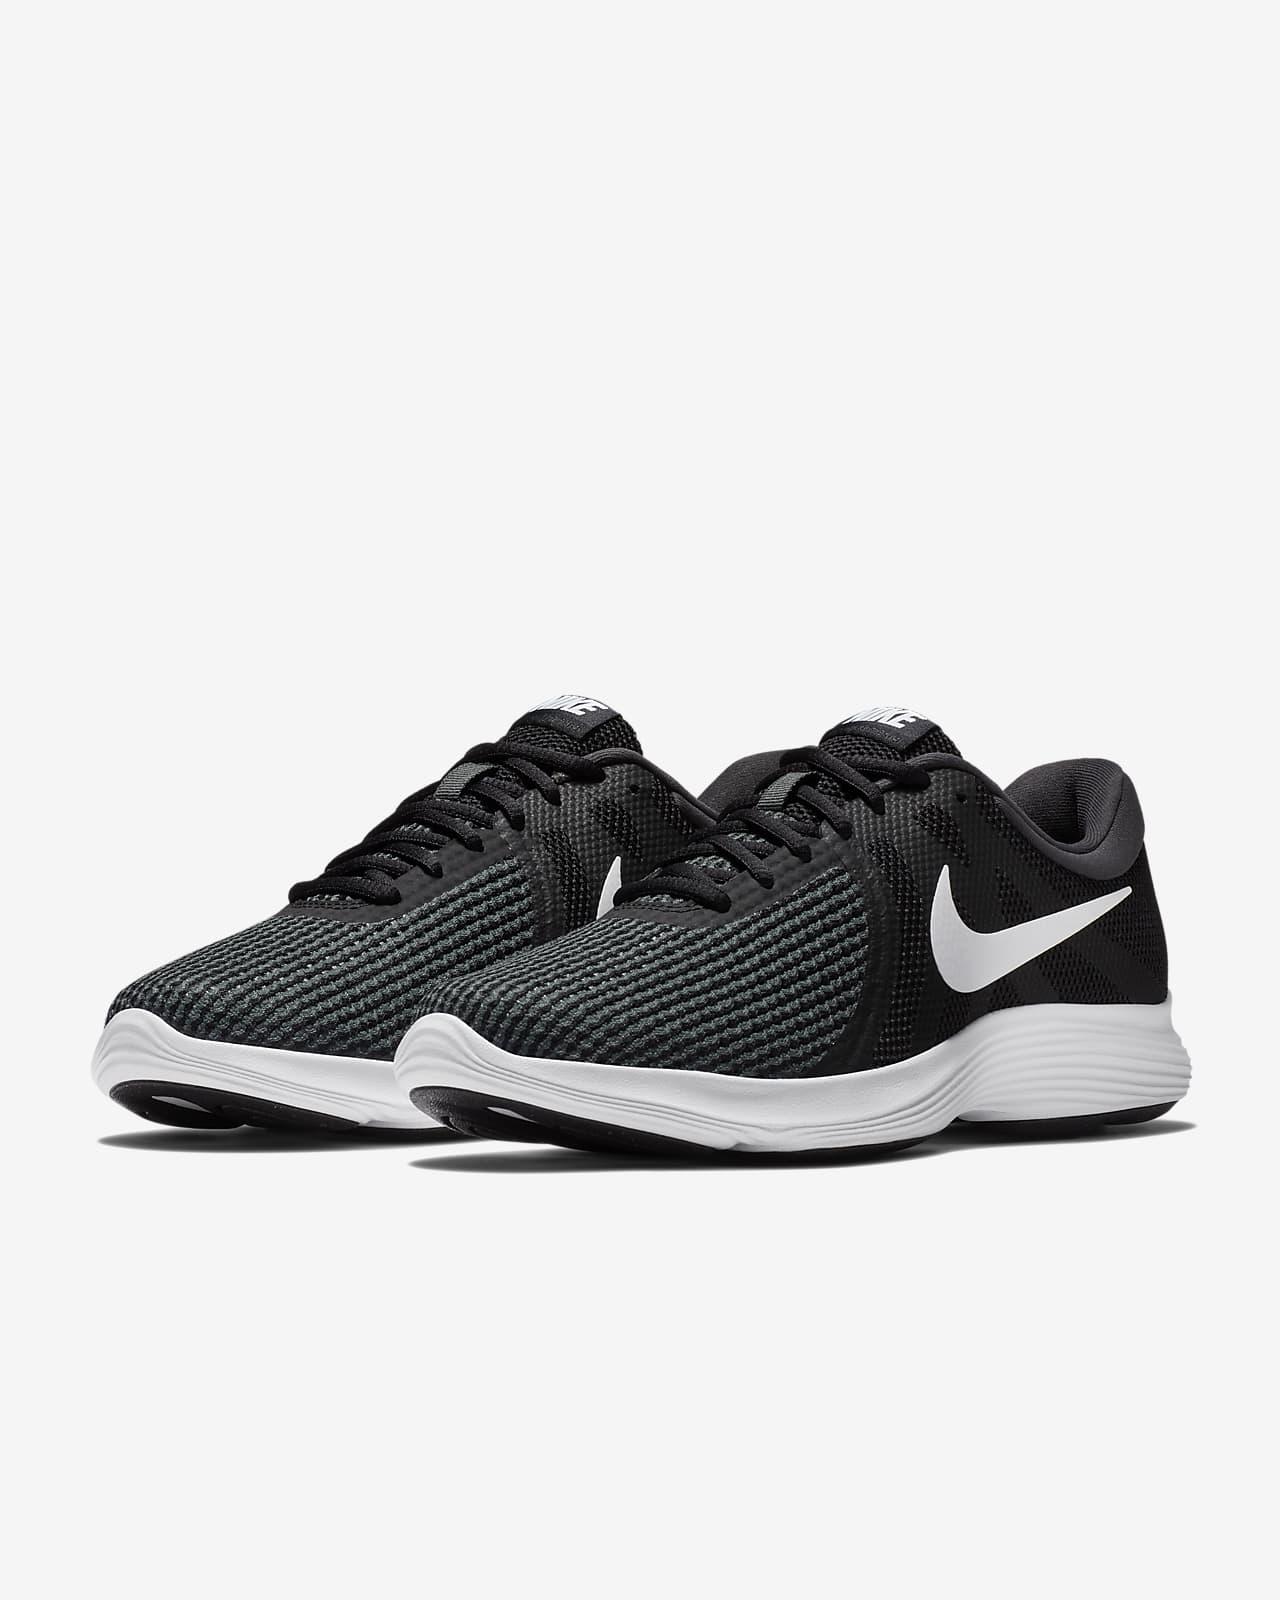 Chaussure de running Nike Revolution 4 pour Femme